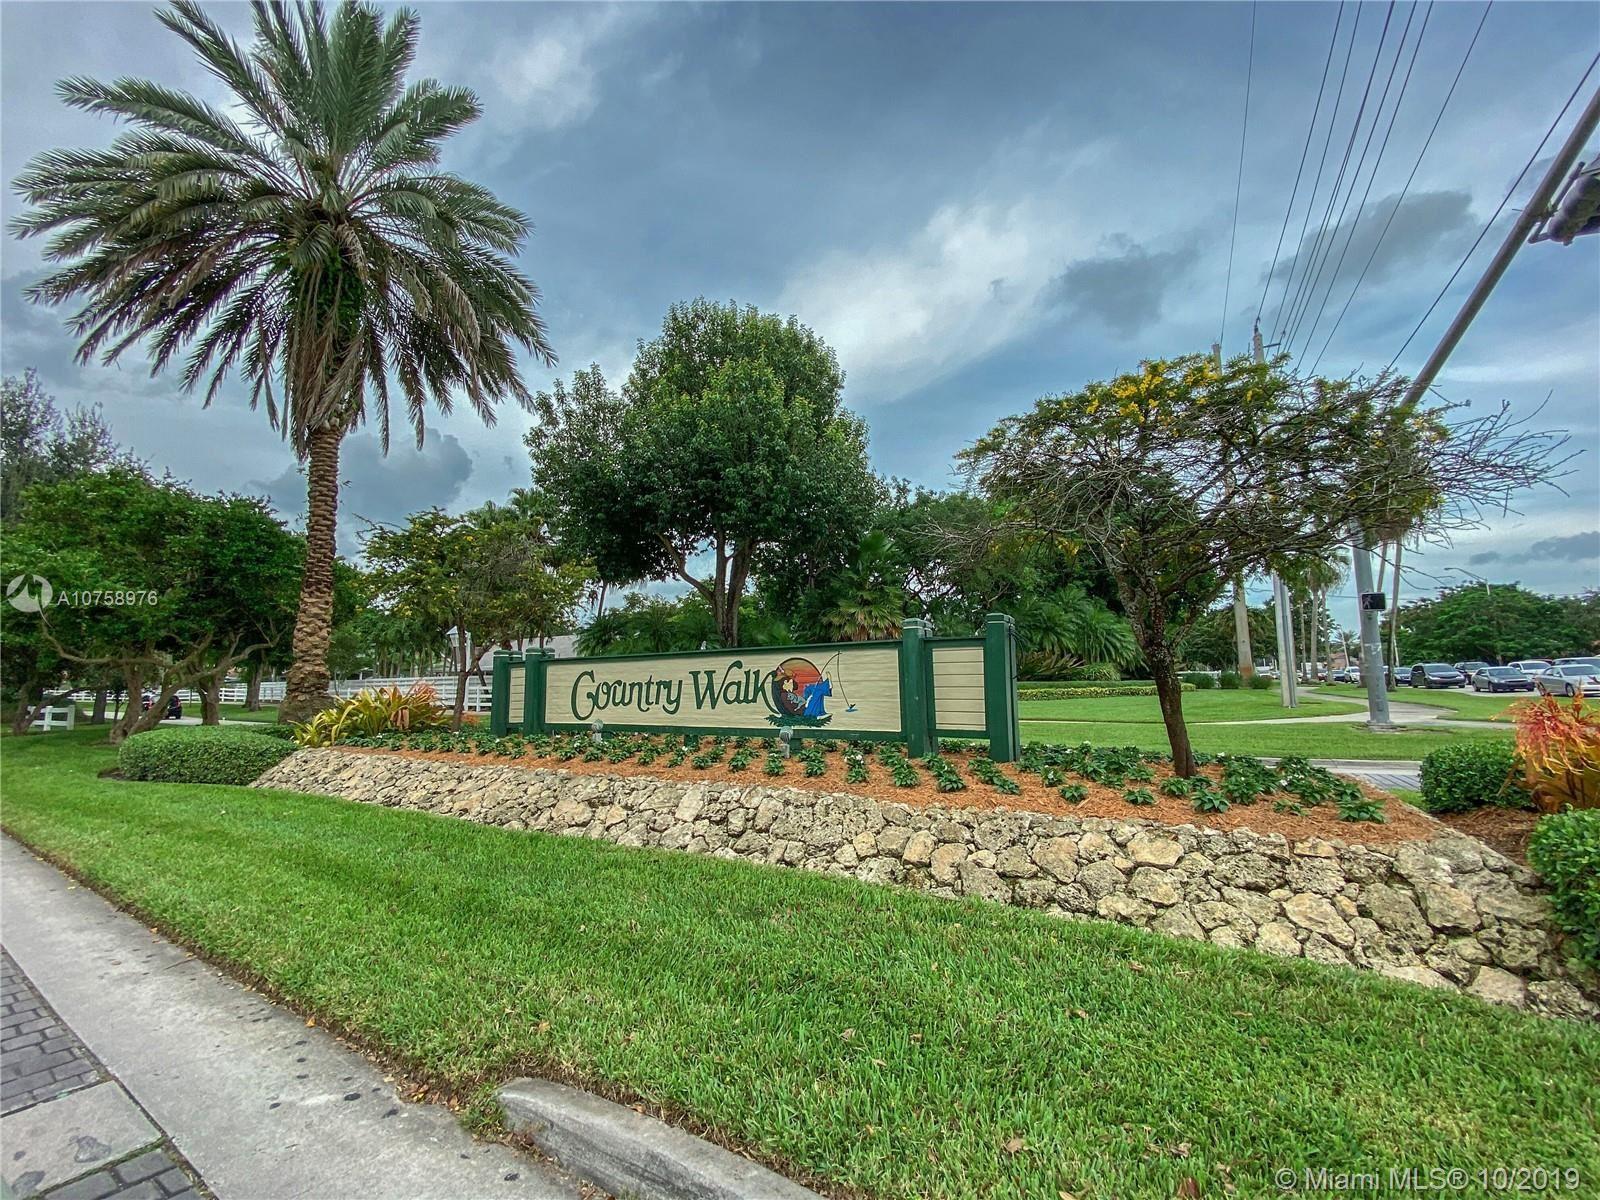 15044 SW 142nd Pl, Miami, FL 33186 - MLS#: A10758976